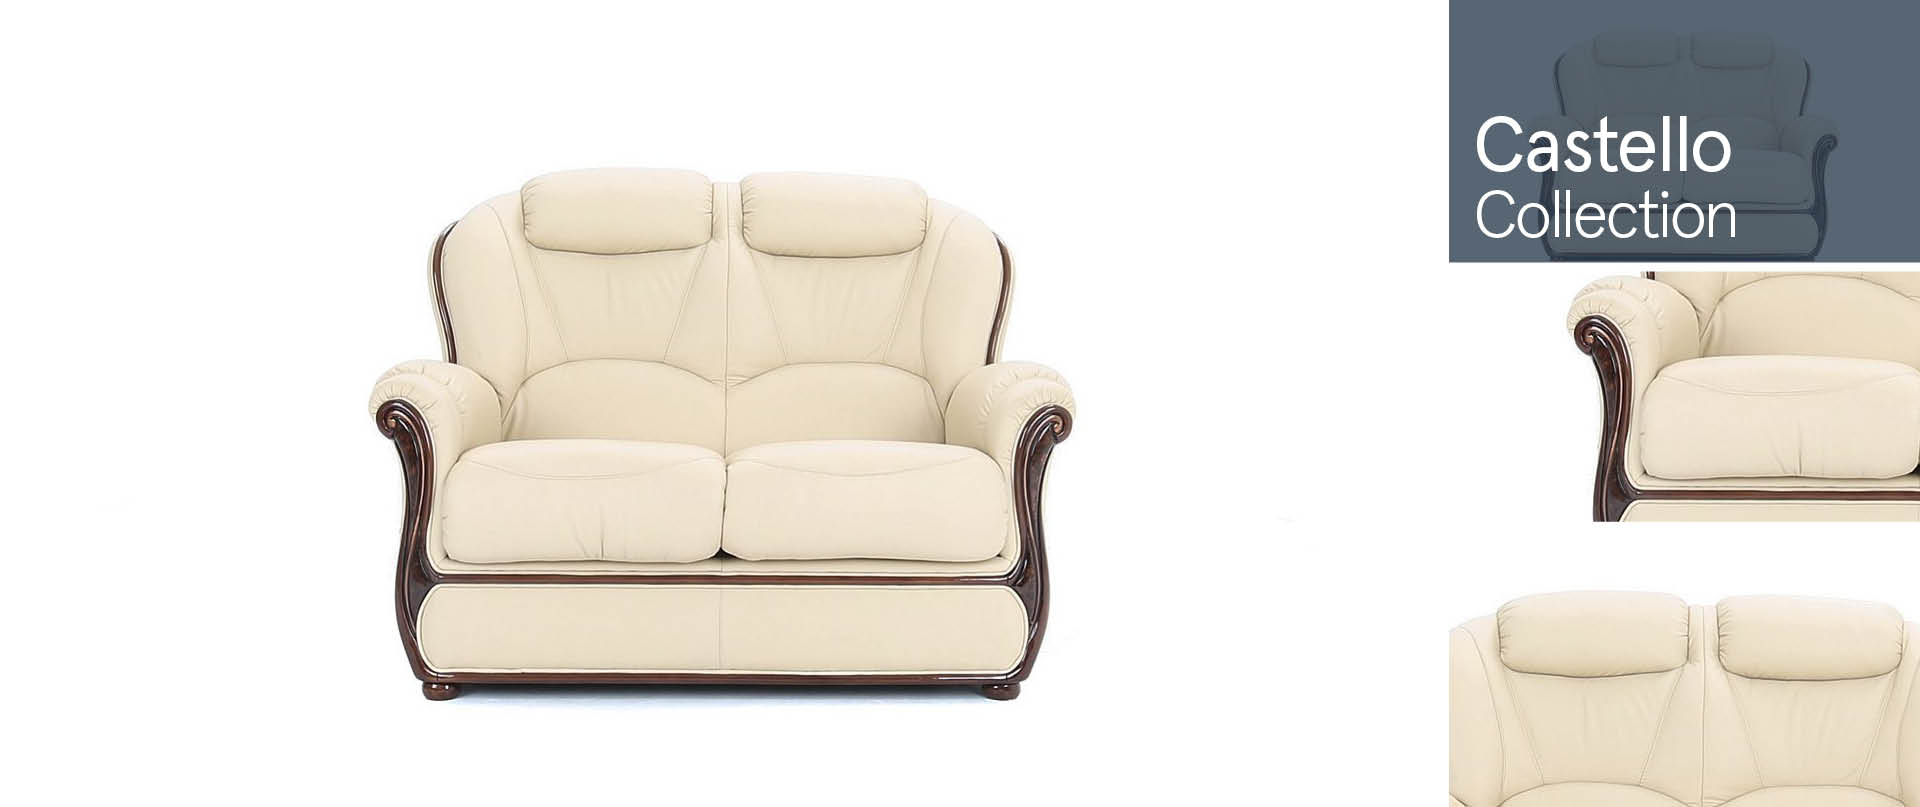 Castello Leather Sofa Ranges